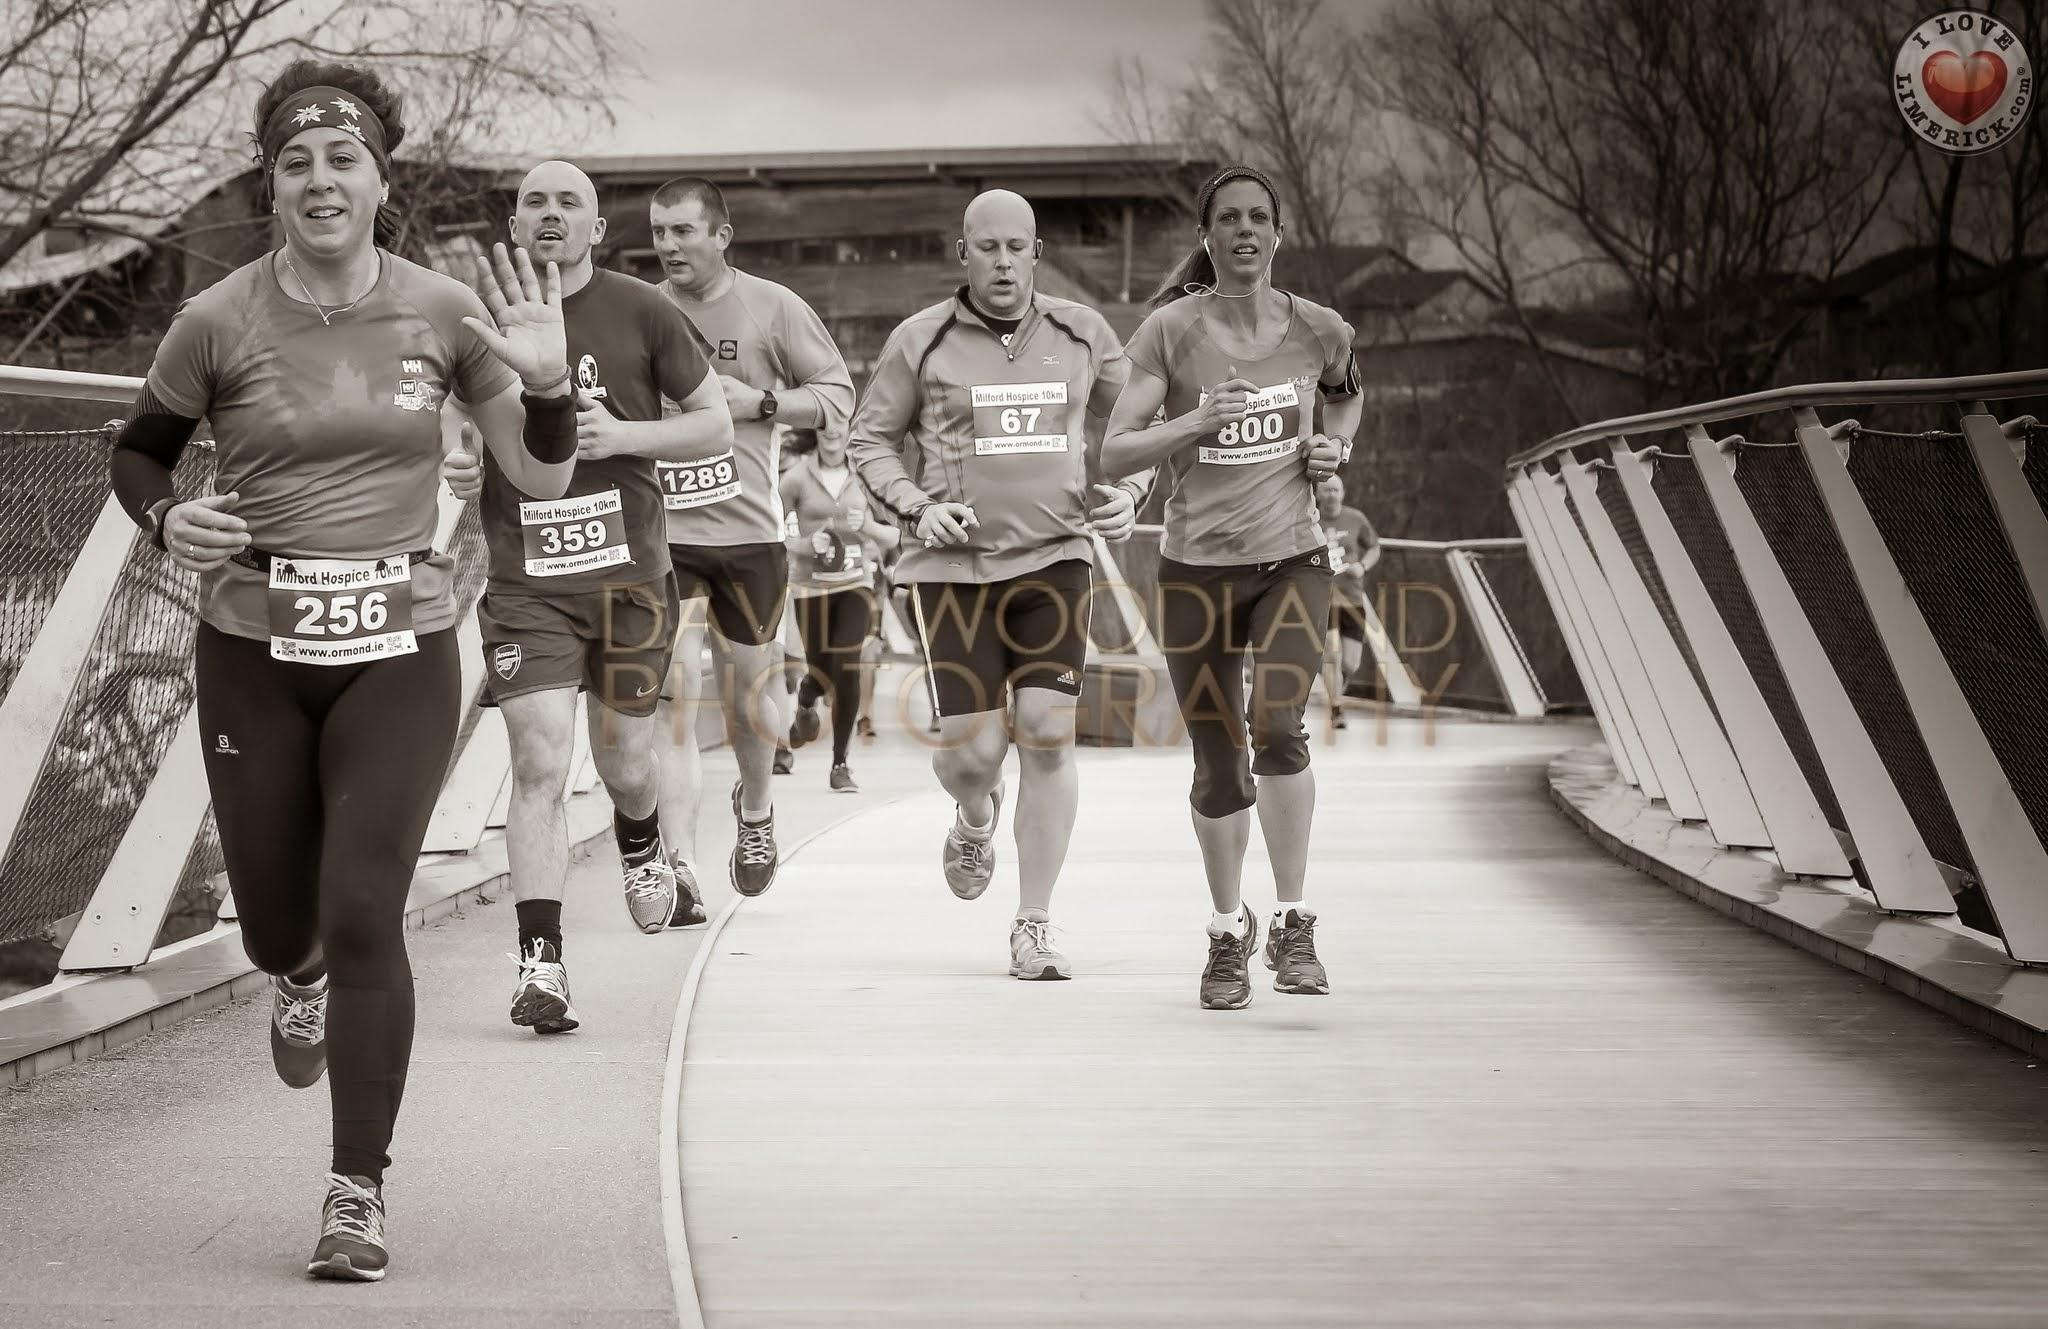 Milford Hospice 10km Run Walk 2015